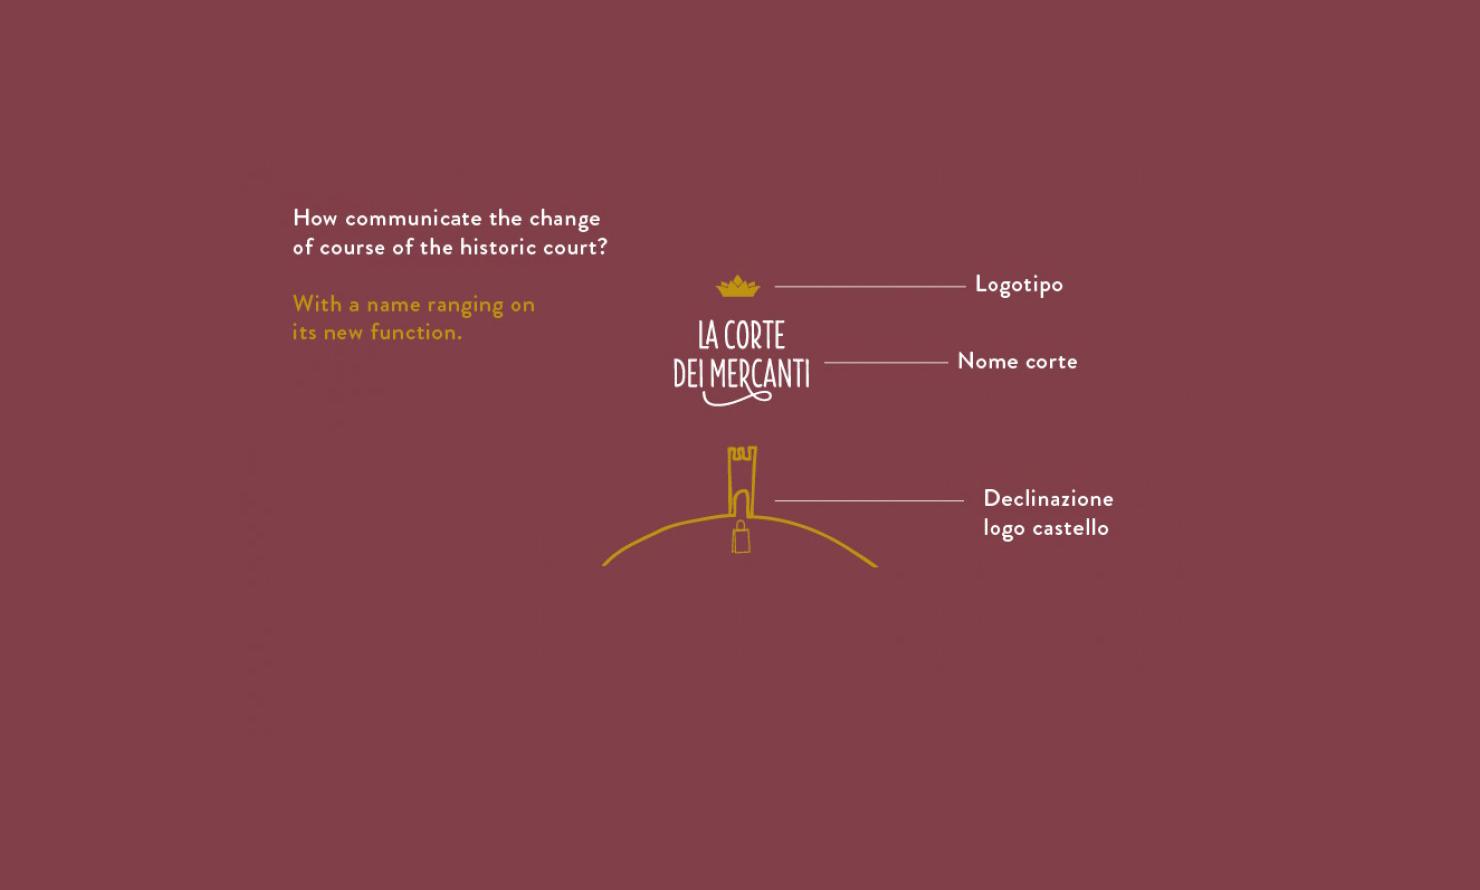 https://www.kubelibre.com/uploads/Slider-work-tutti-clienti/manital-vistaterra-la-corte-dei-mercanti-le-botteghe-di-vistaterra-3.jpg